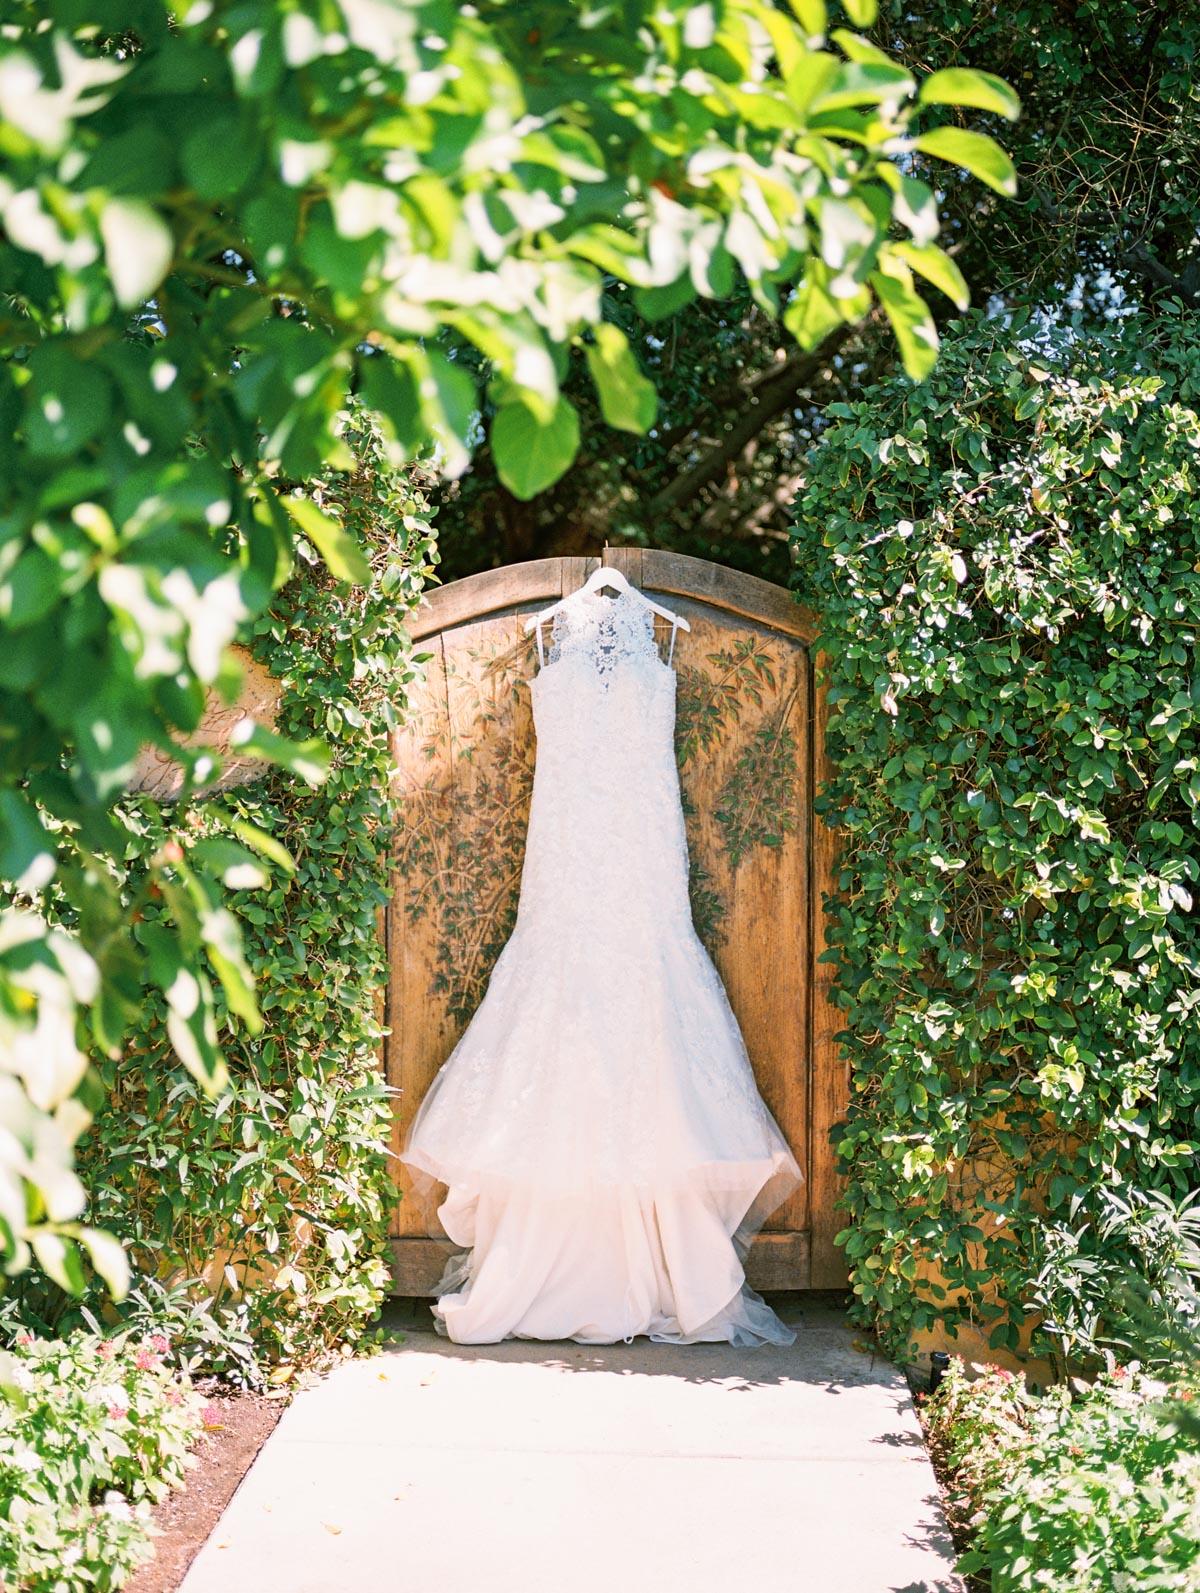 wedding-dress-hanging.jpg